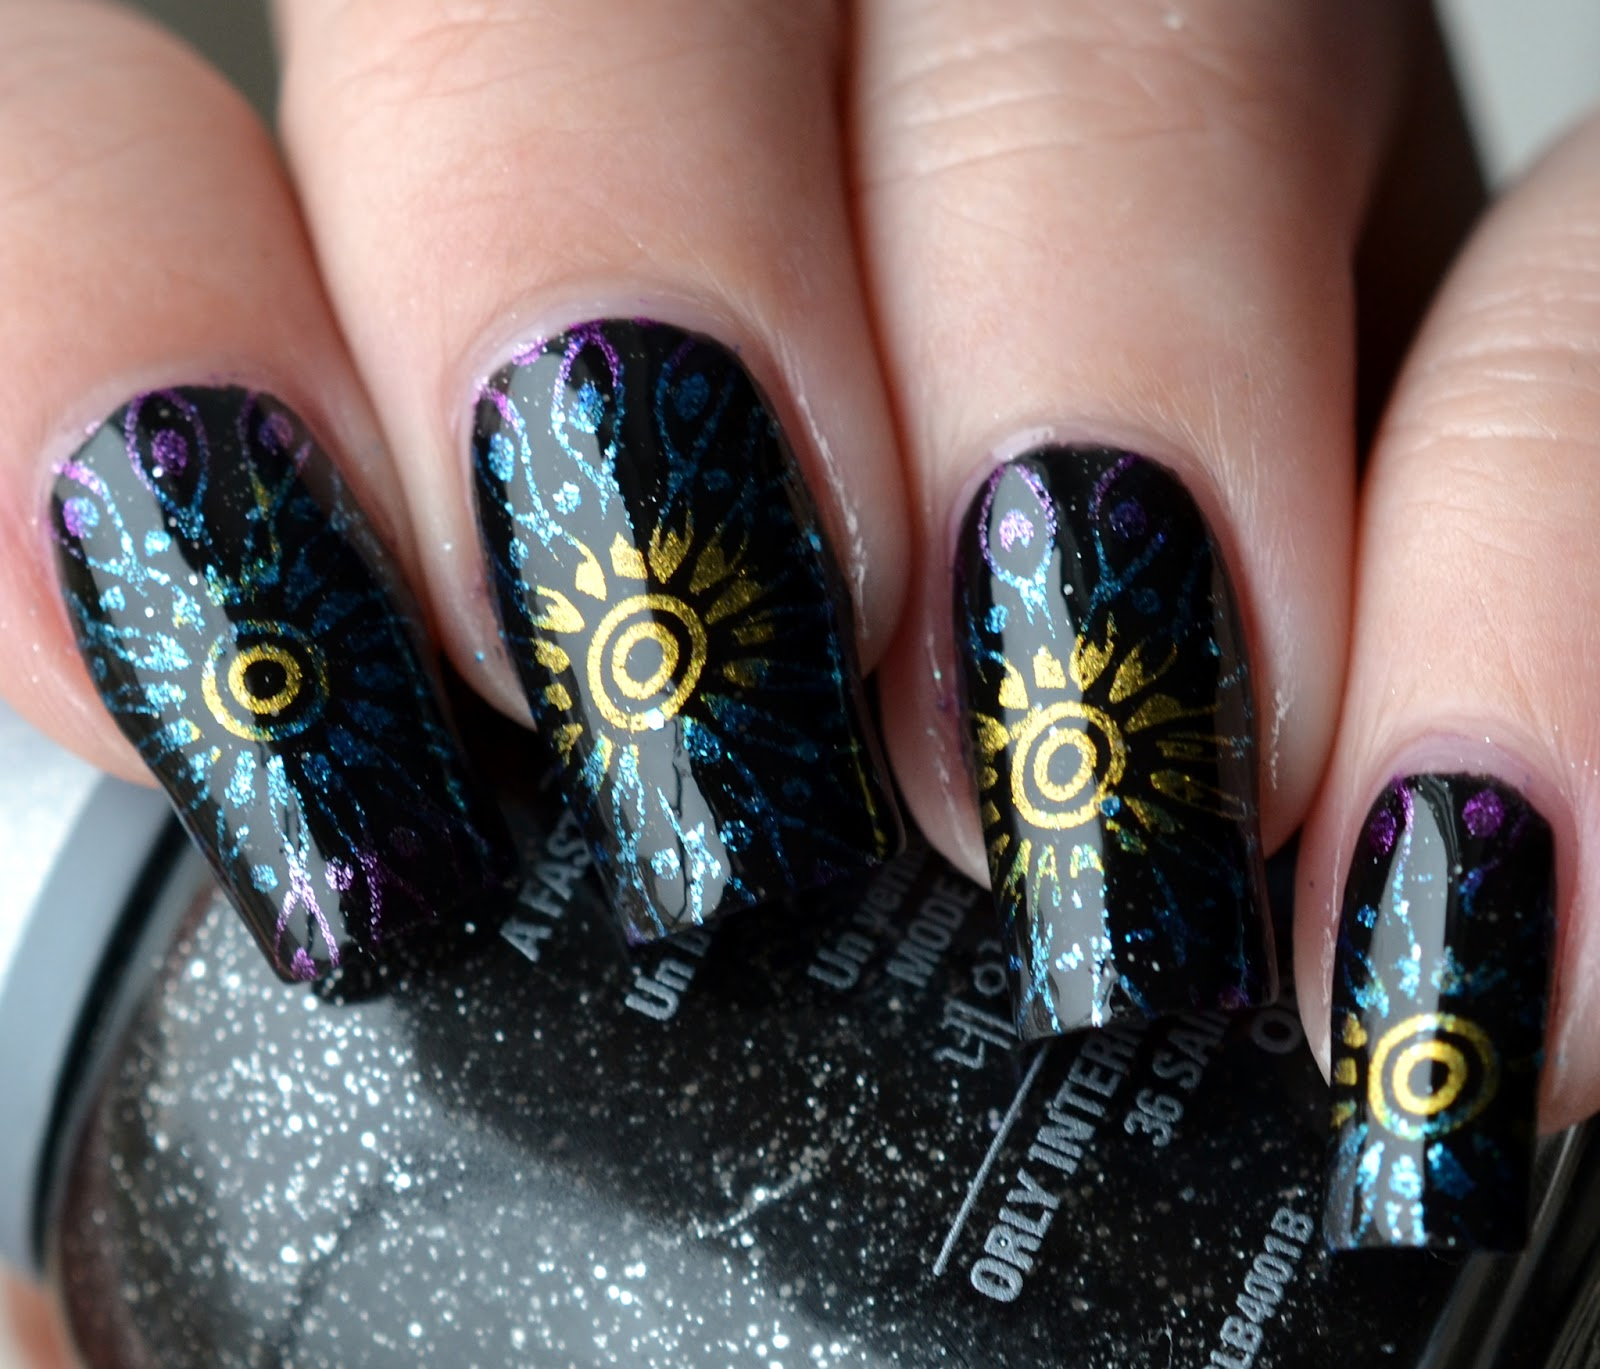 http://lenas-sofa.blogspot.de/2015/04/orly-sparkling-glitters-goth.html